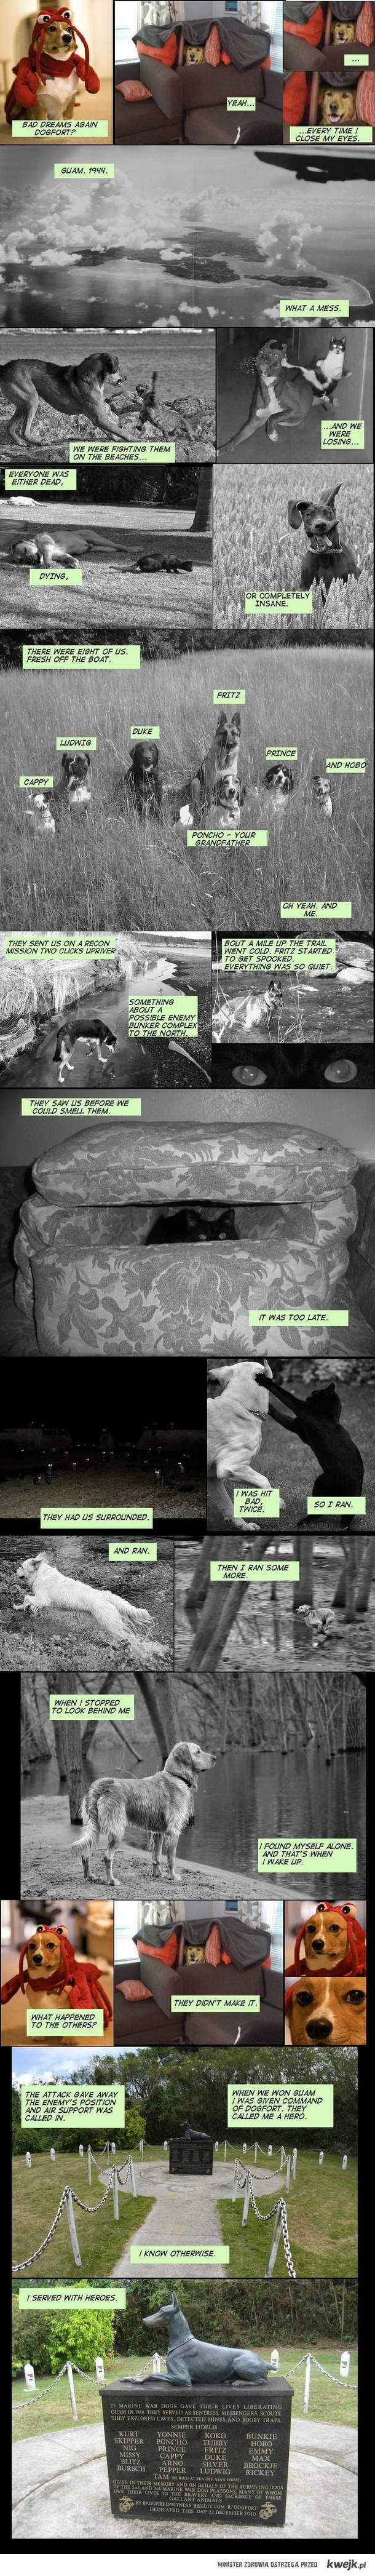 dogs - true story